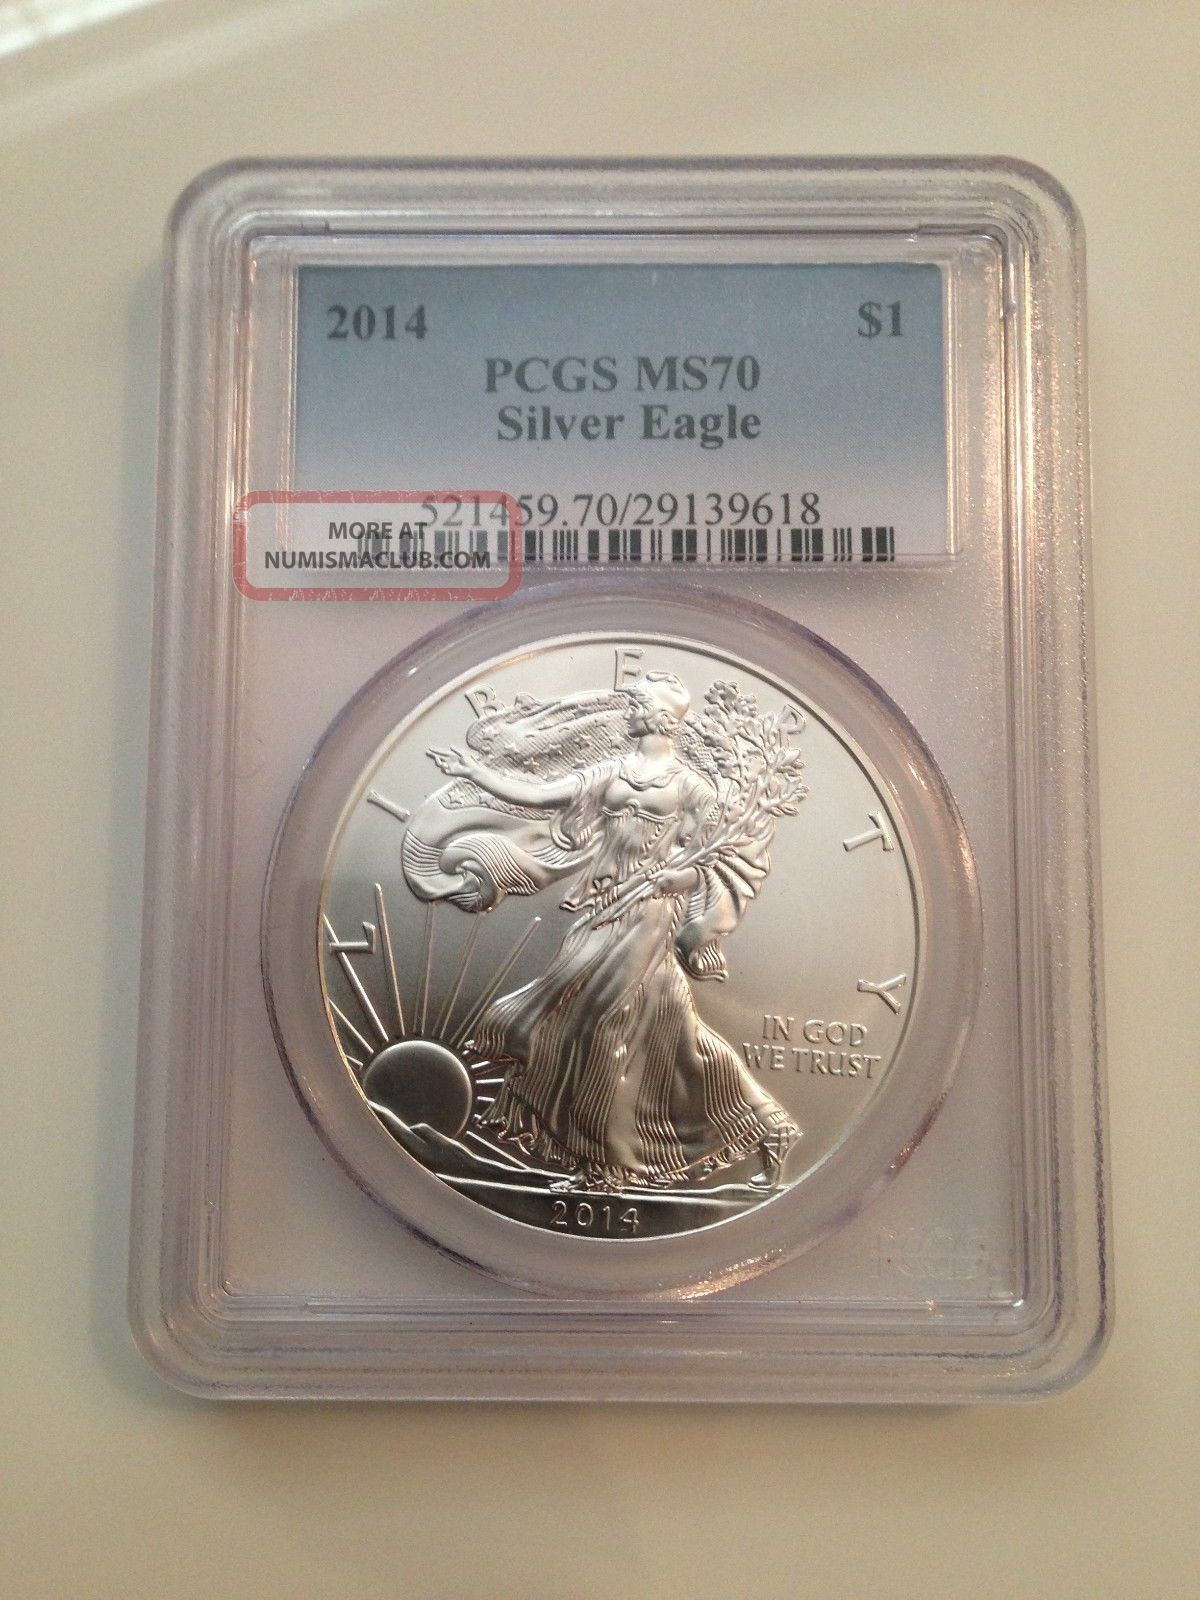 2014 Pcgs Ms - 70 American Eagle Graded Perfect Fresh Slab $1 Silver Eagle Gem Silver photo